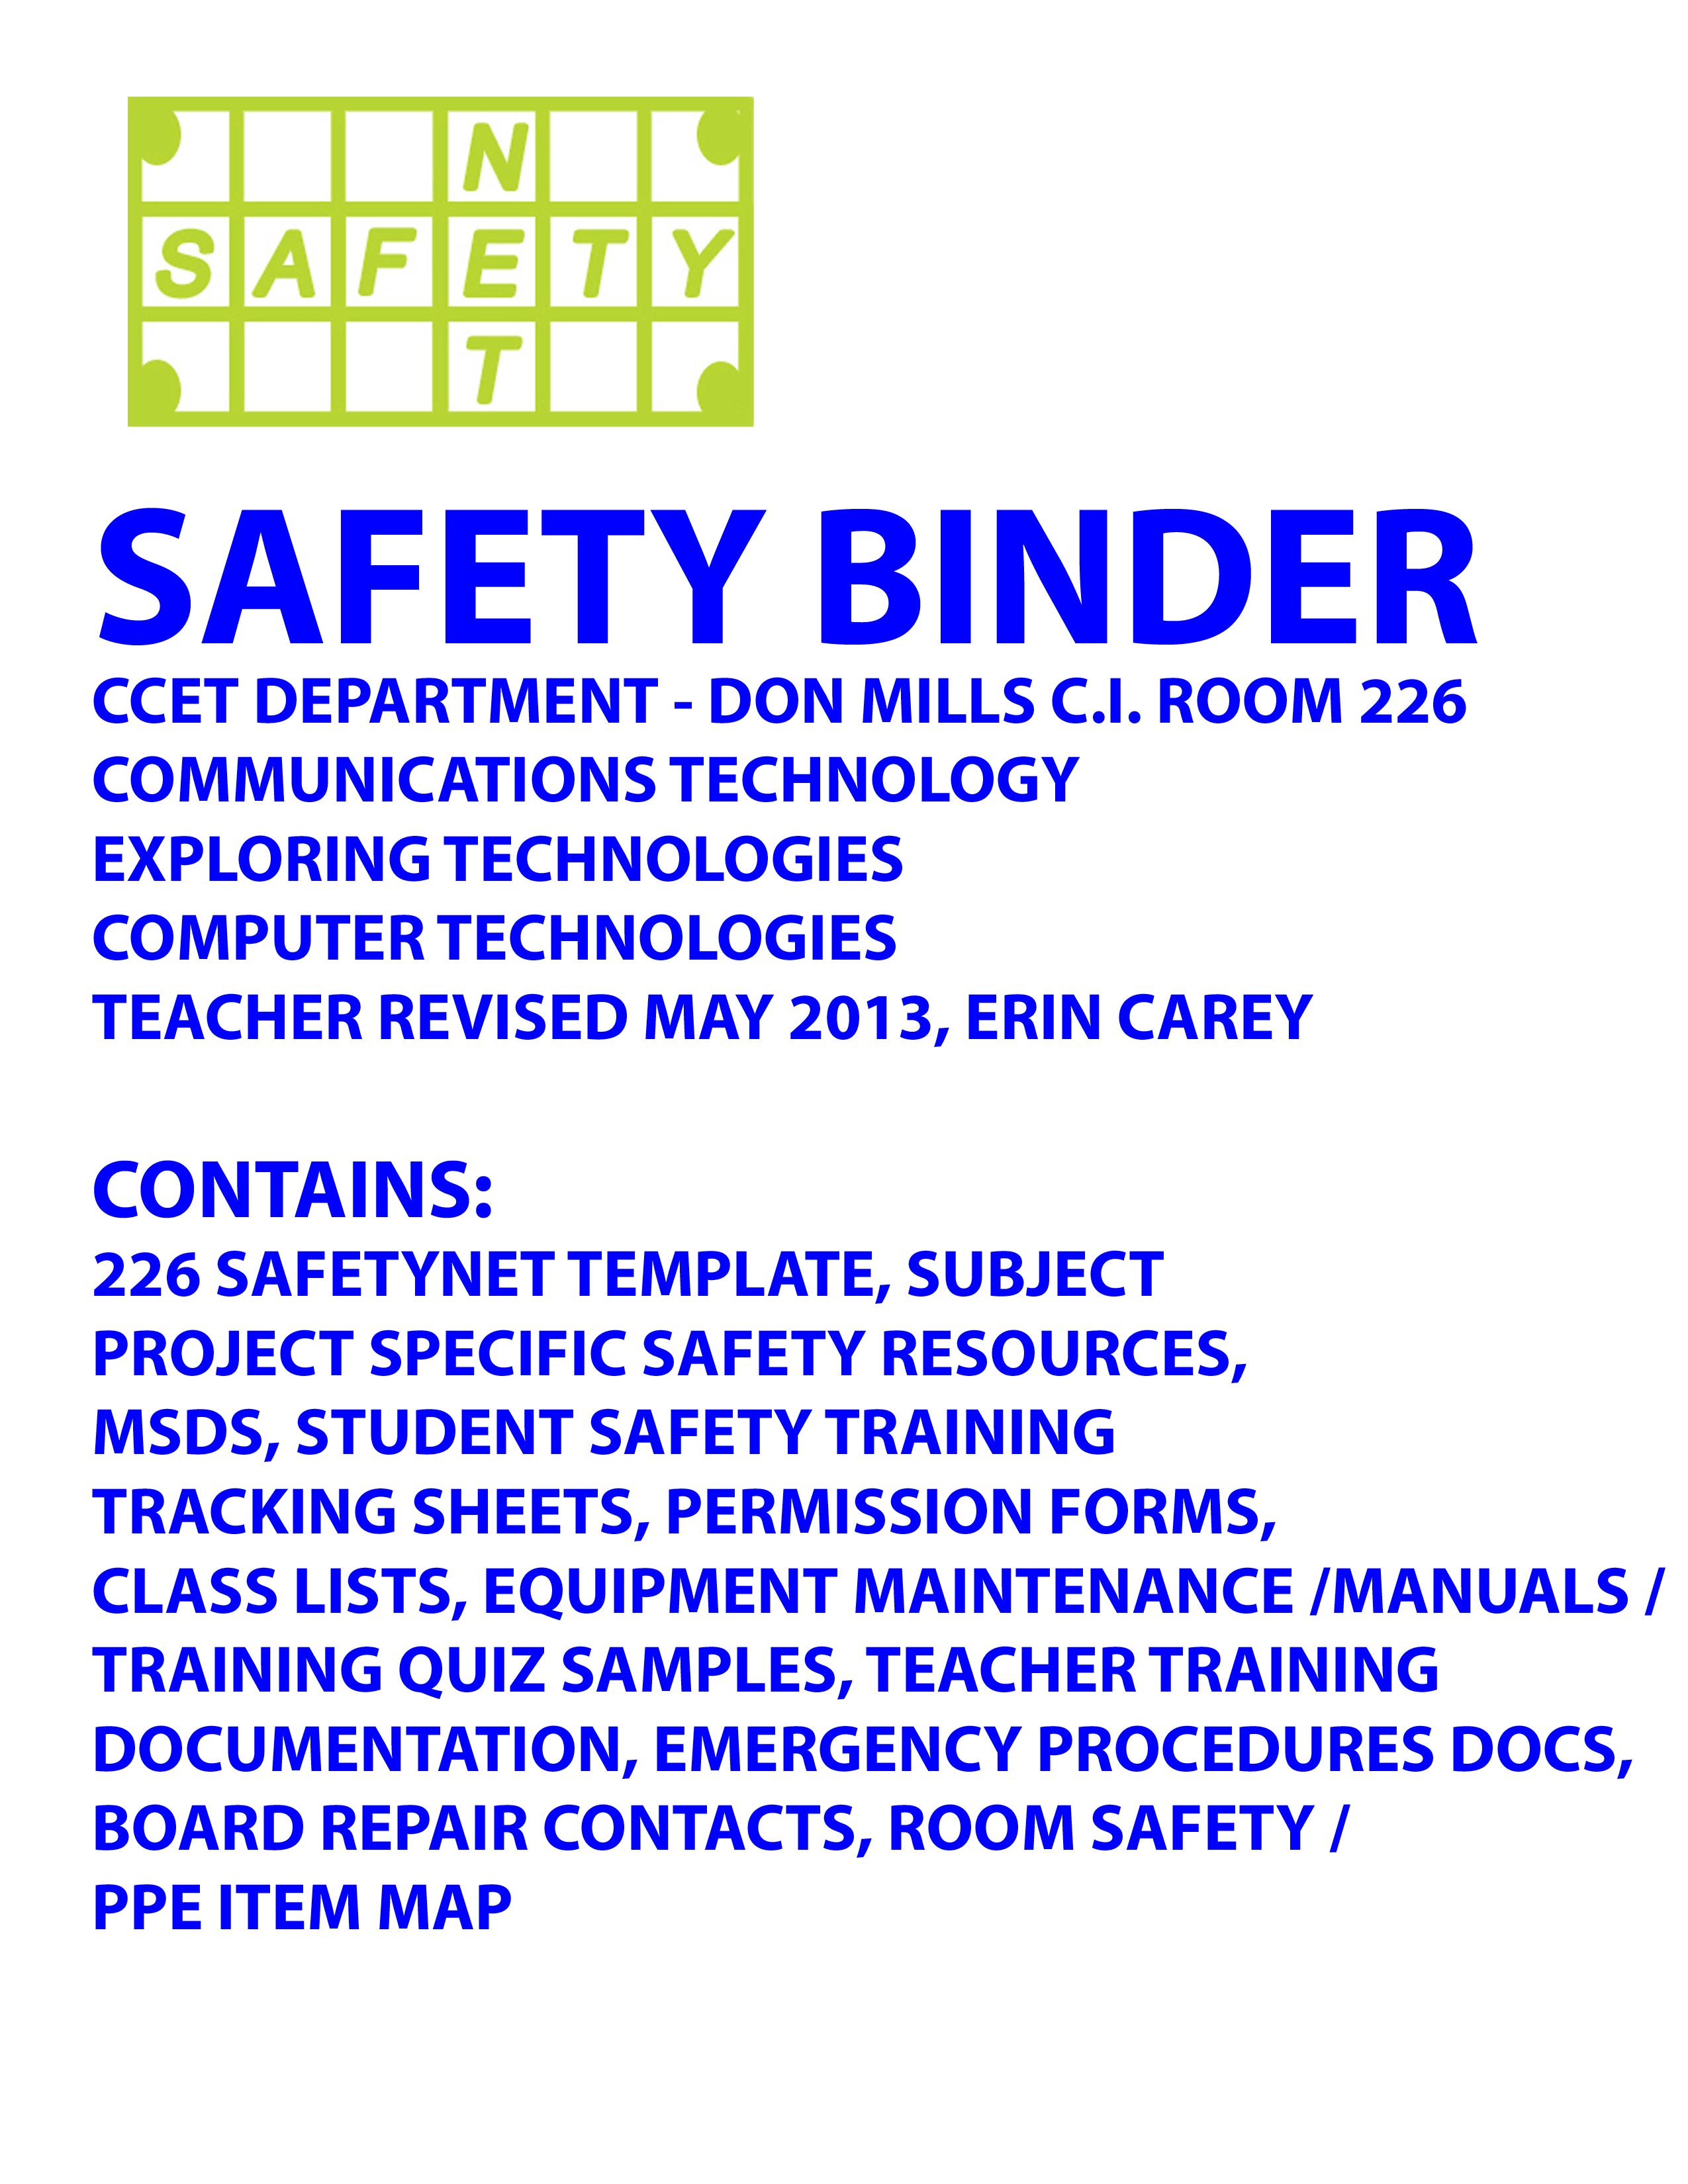 Octe Safetynet Electronic Circuit Board Repair Pdf Procedures Binder Exemplar